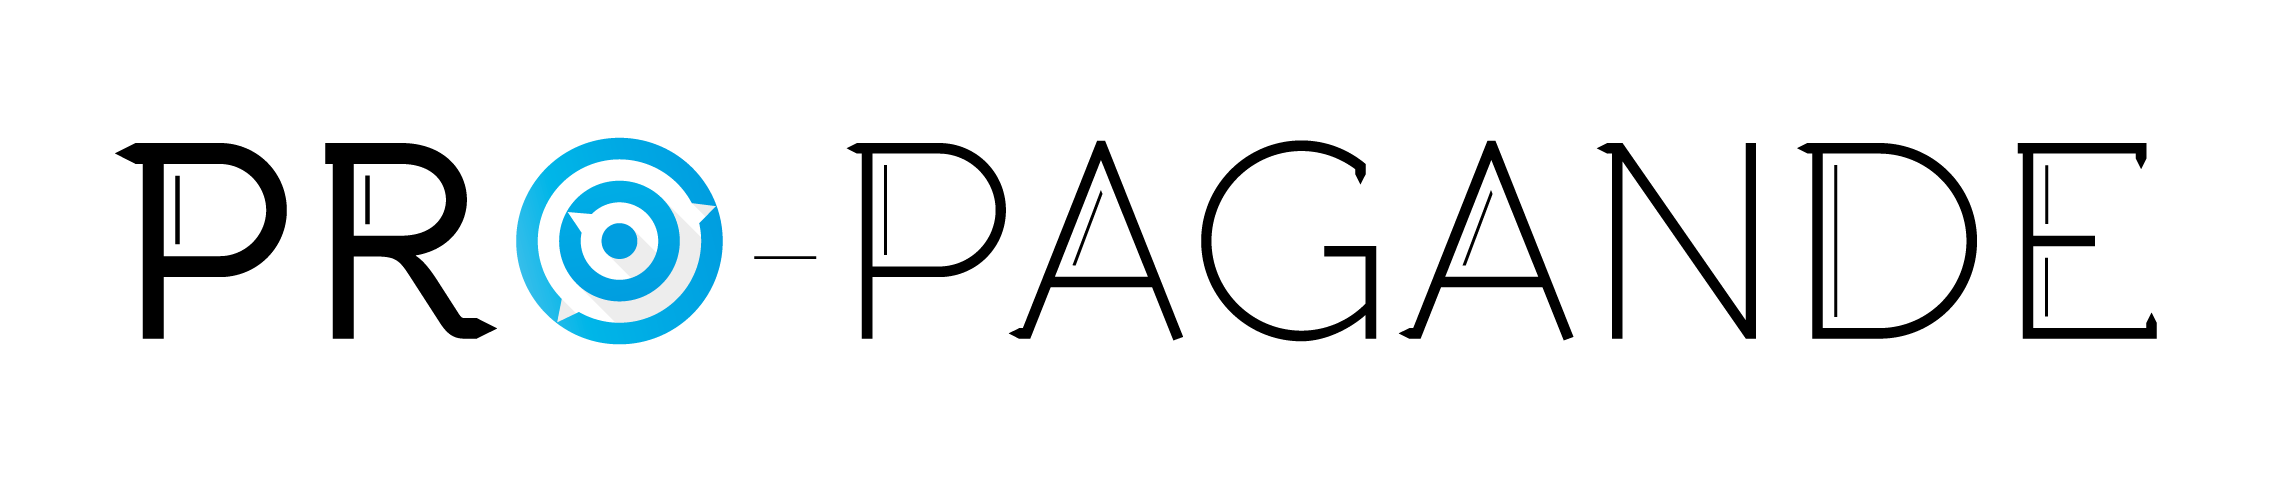 Logo 2020 horizontal hd Pro-pagande